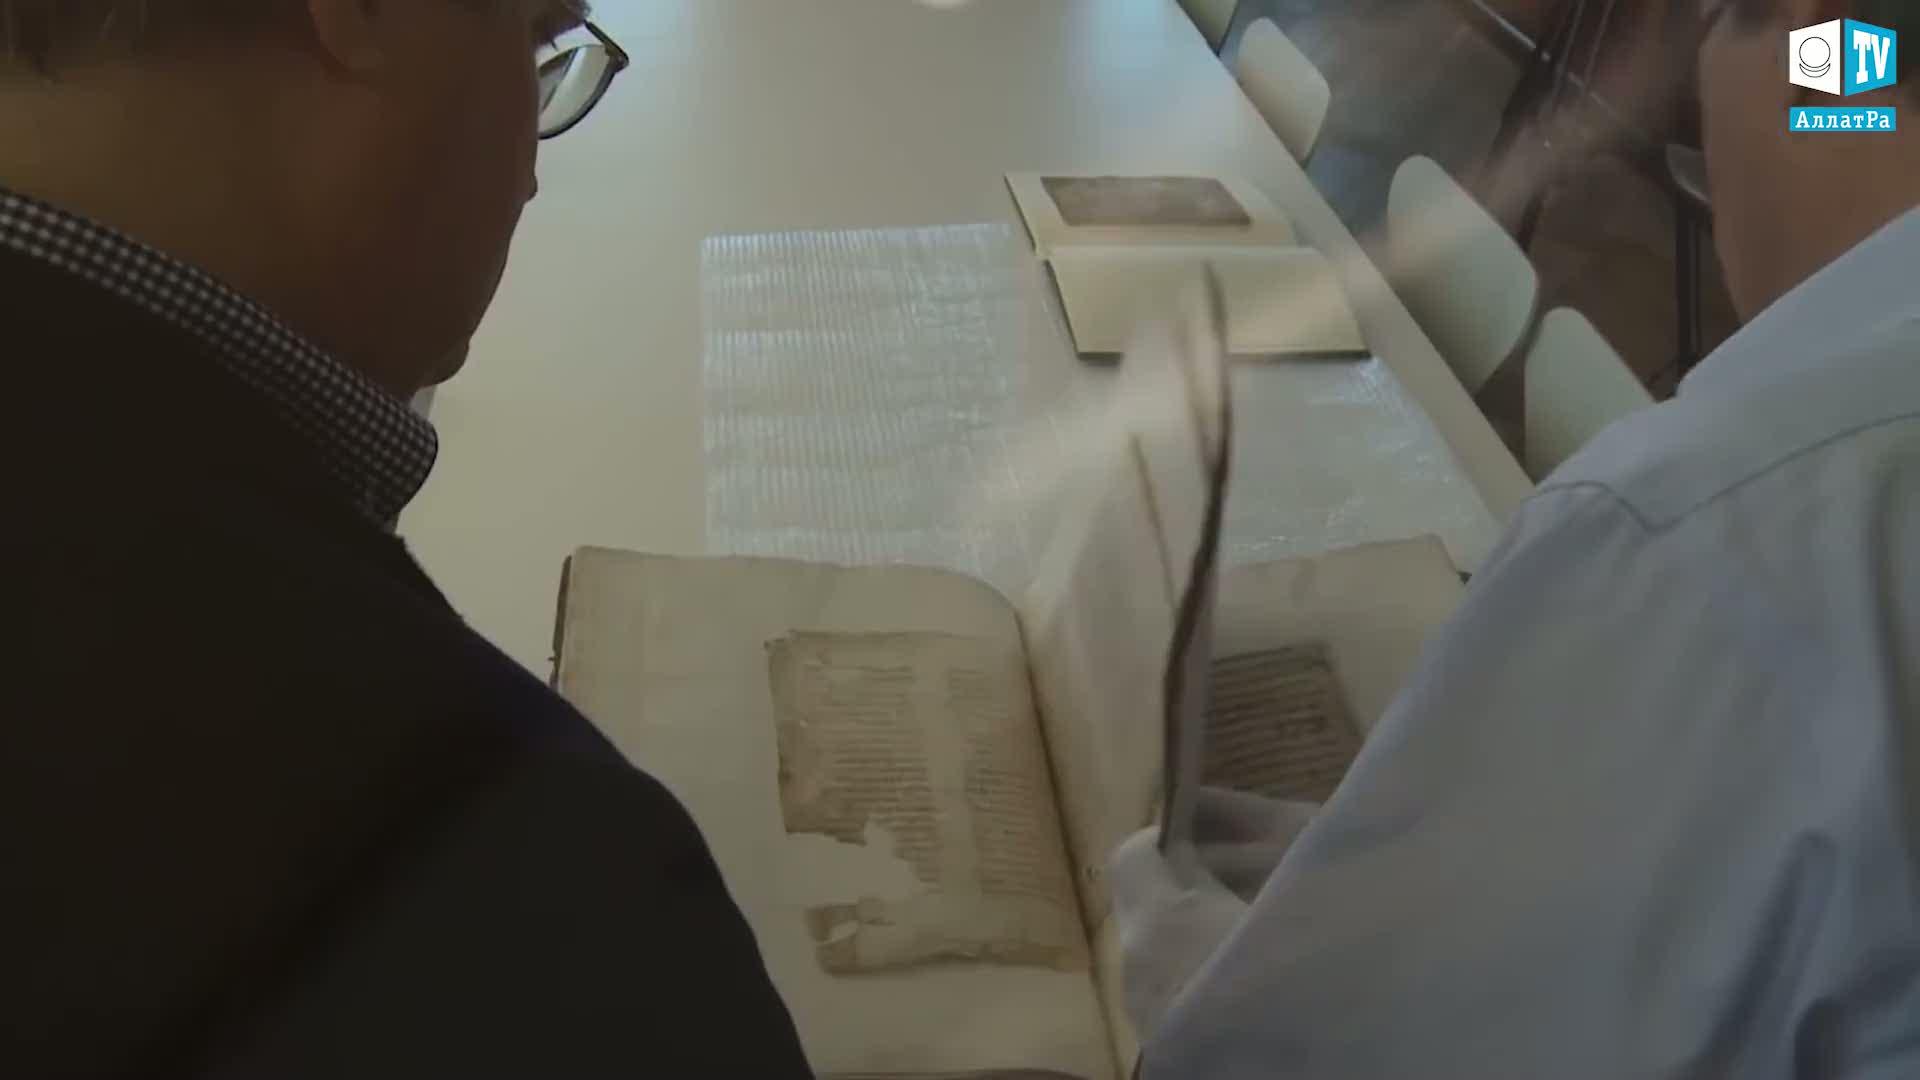 Starodávné texty 2. Foto